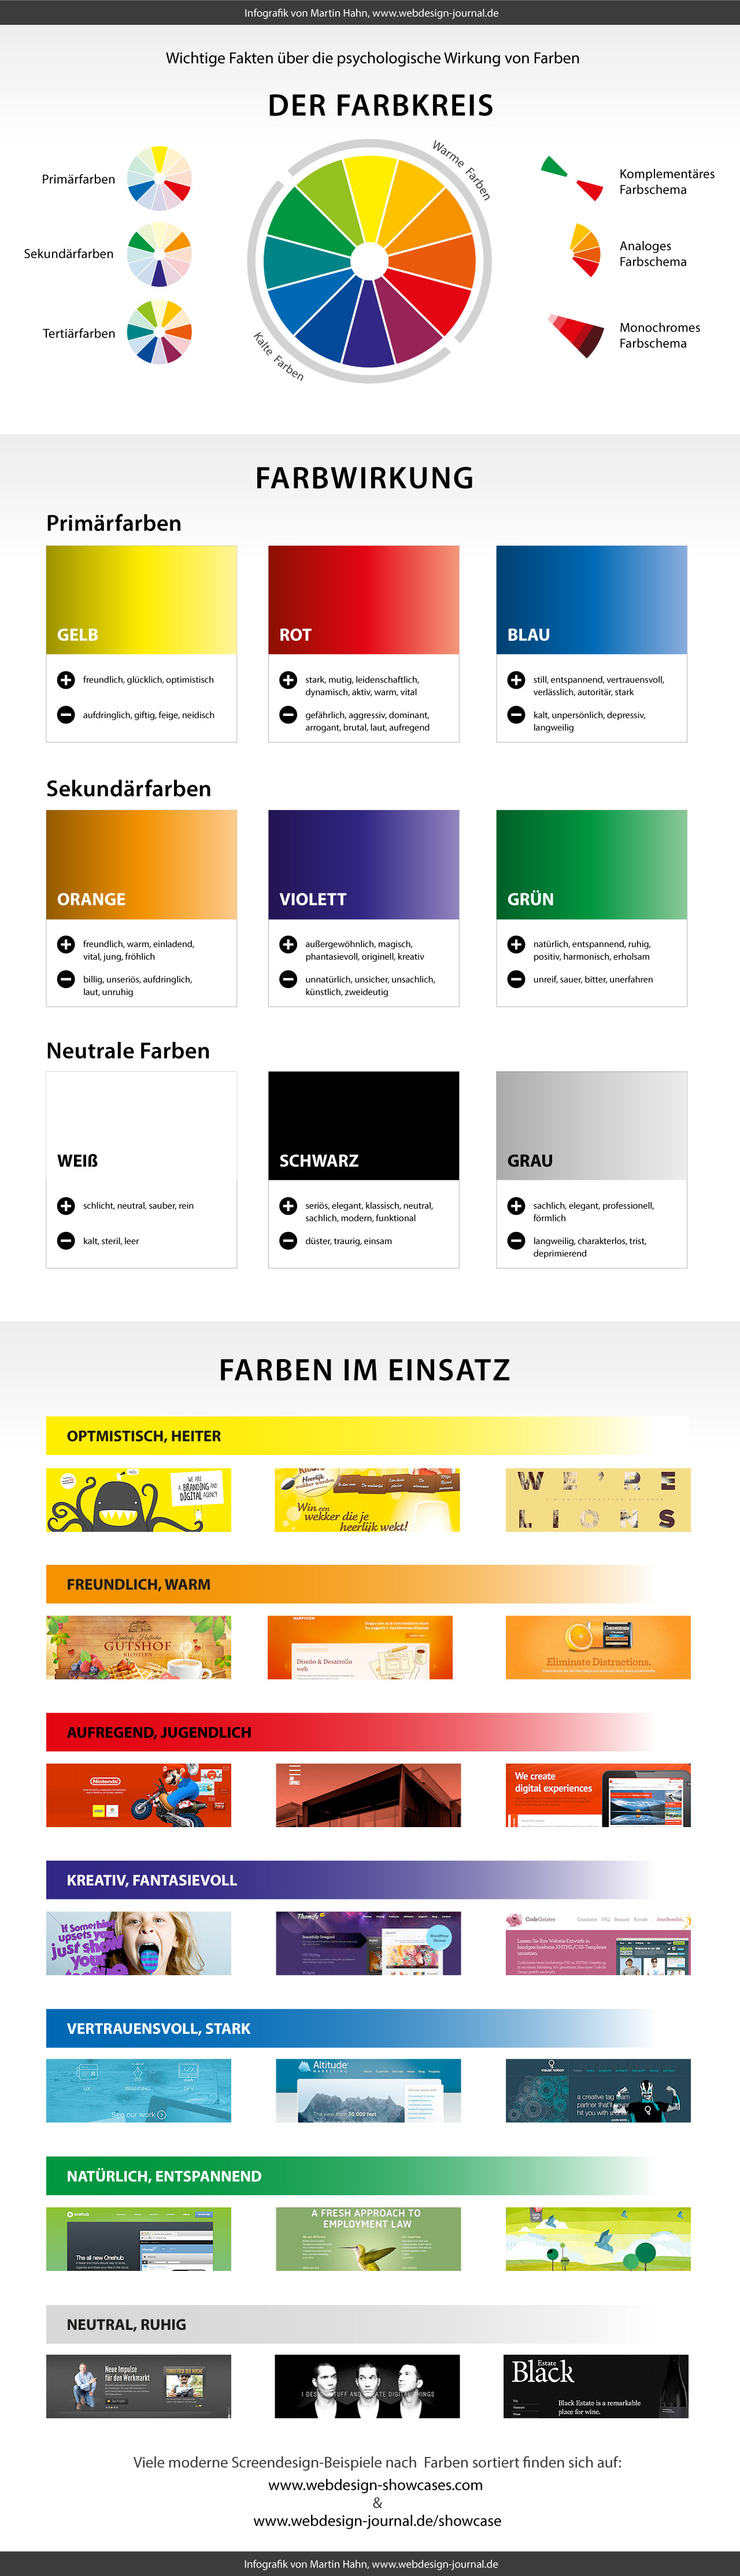 farbwirkung bildanalyse biorhythmuskalender. Black Bedroom Furniture Sets. Home Design Ideas